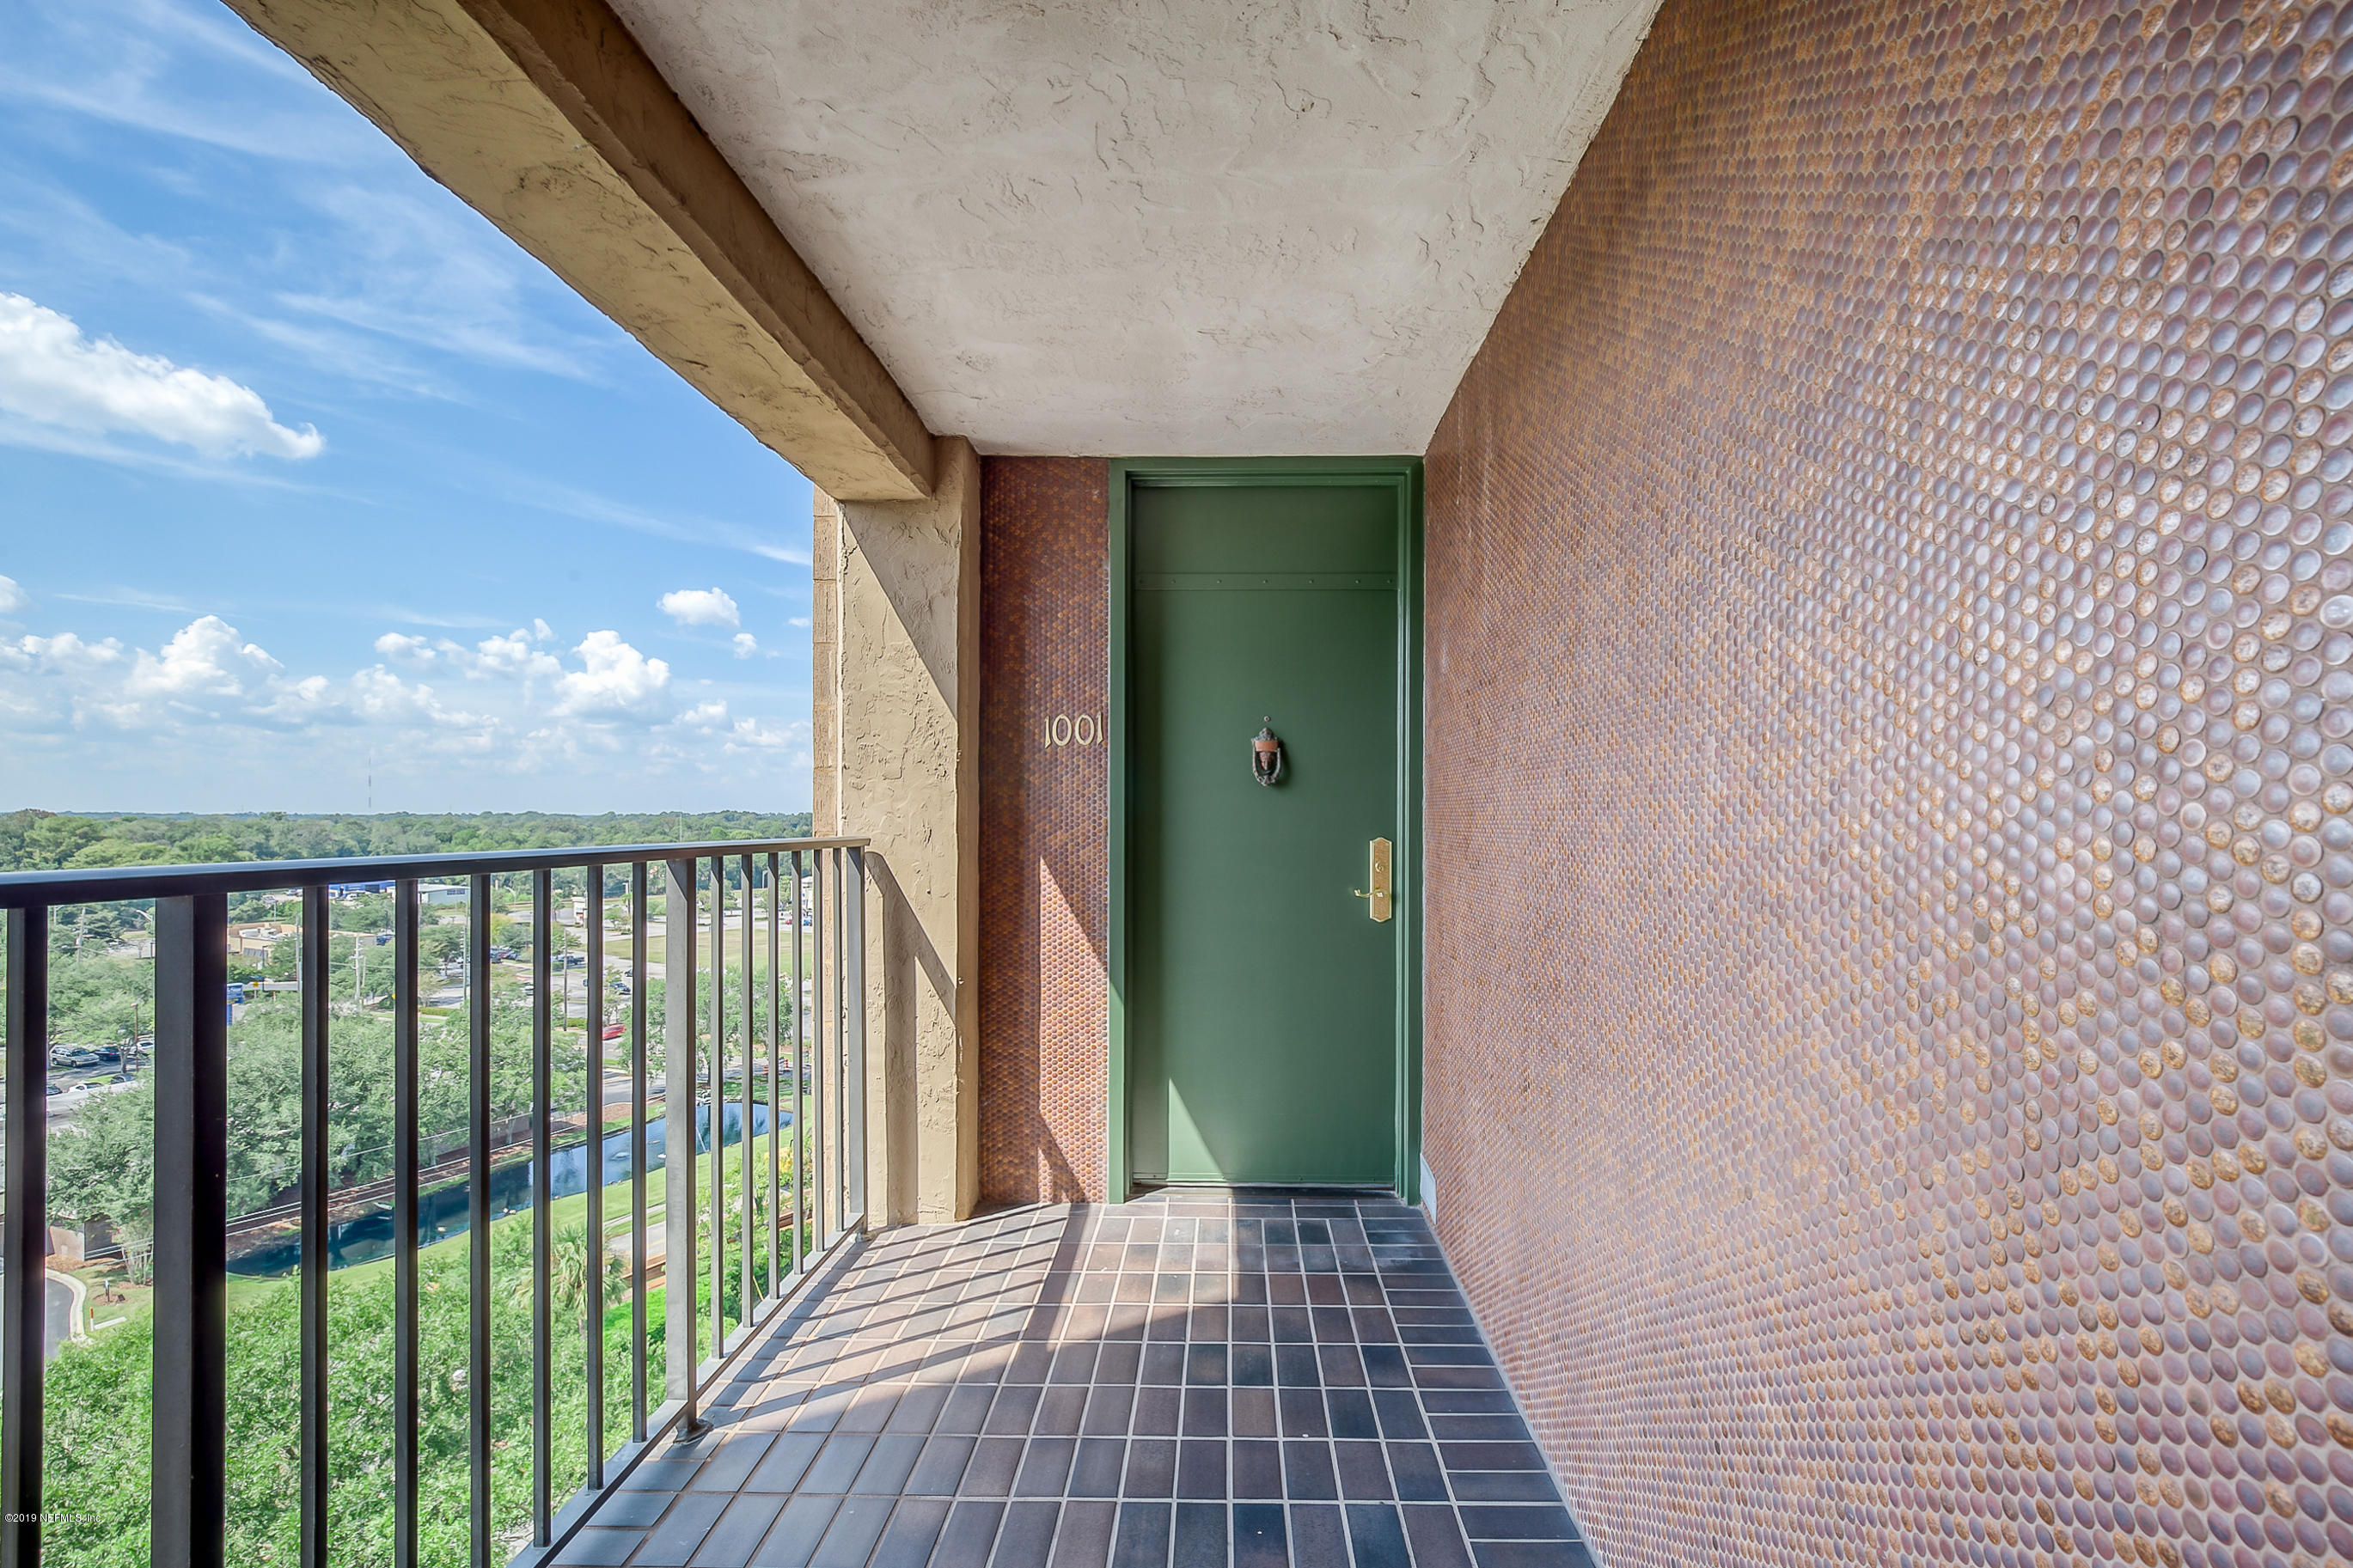 4401 LAKESIDE, JACKSONVILLE, FLORIDA 32210, 2 Bedrooms Bedrooms, ,2 BathroomsBathrooms,Condo,For sale,LAKESIDE,1017907